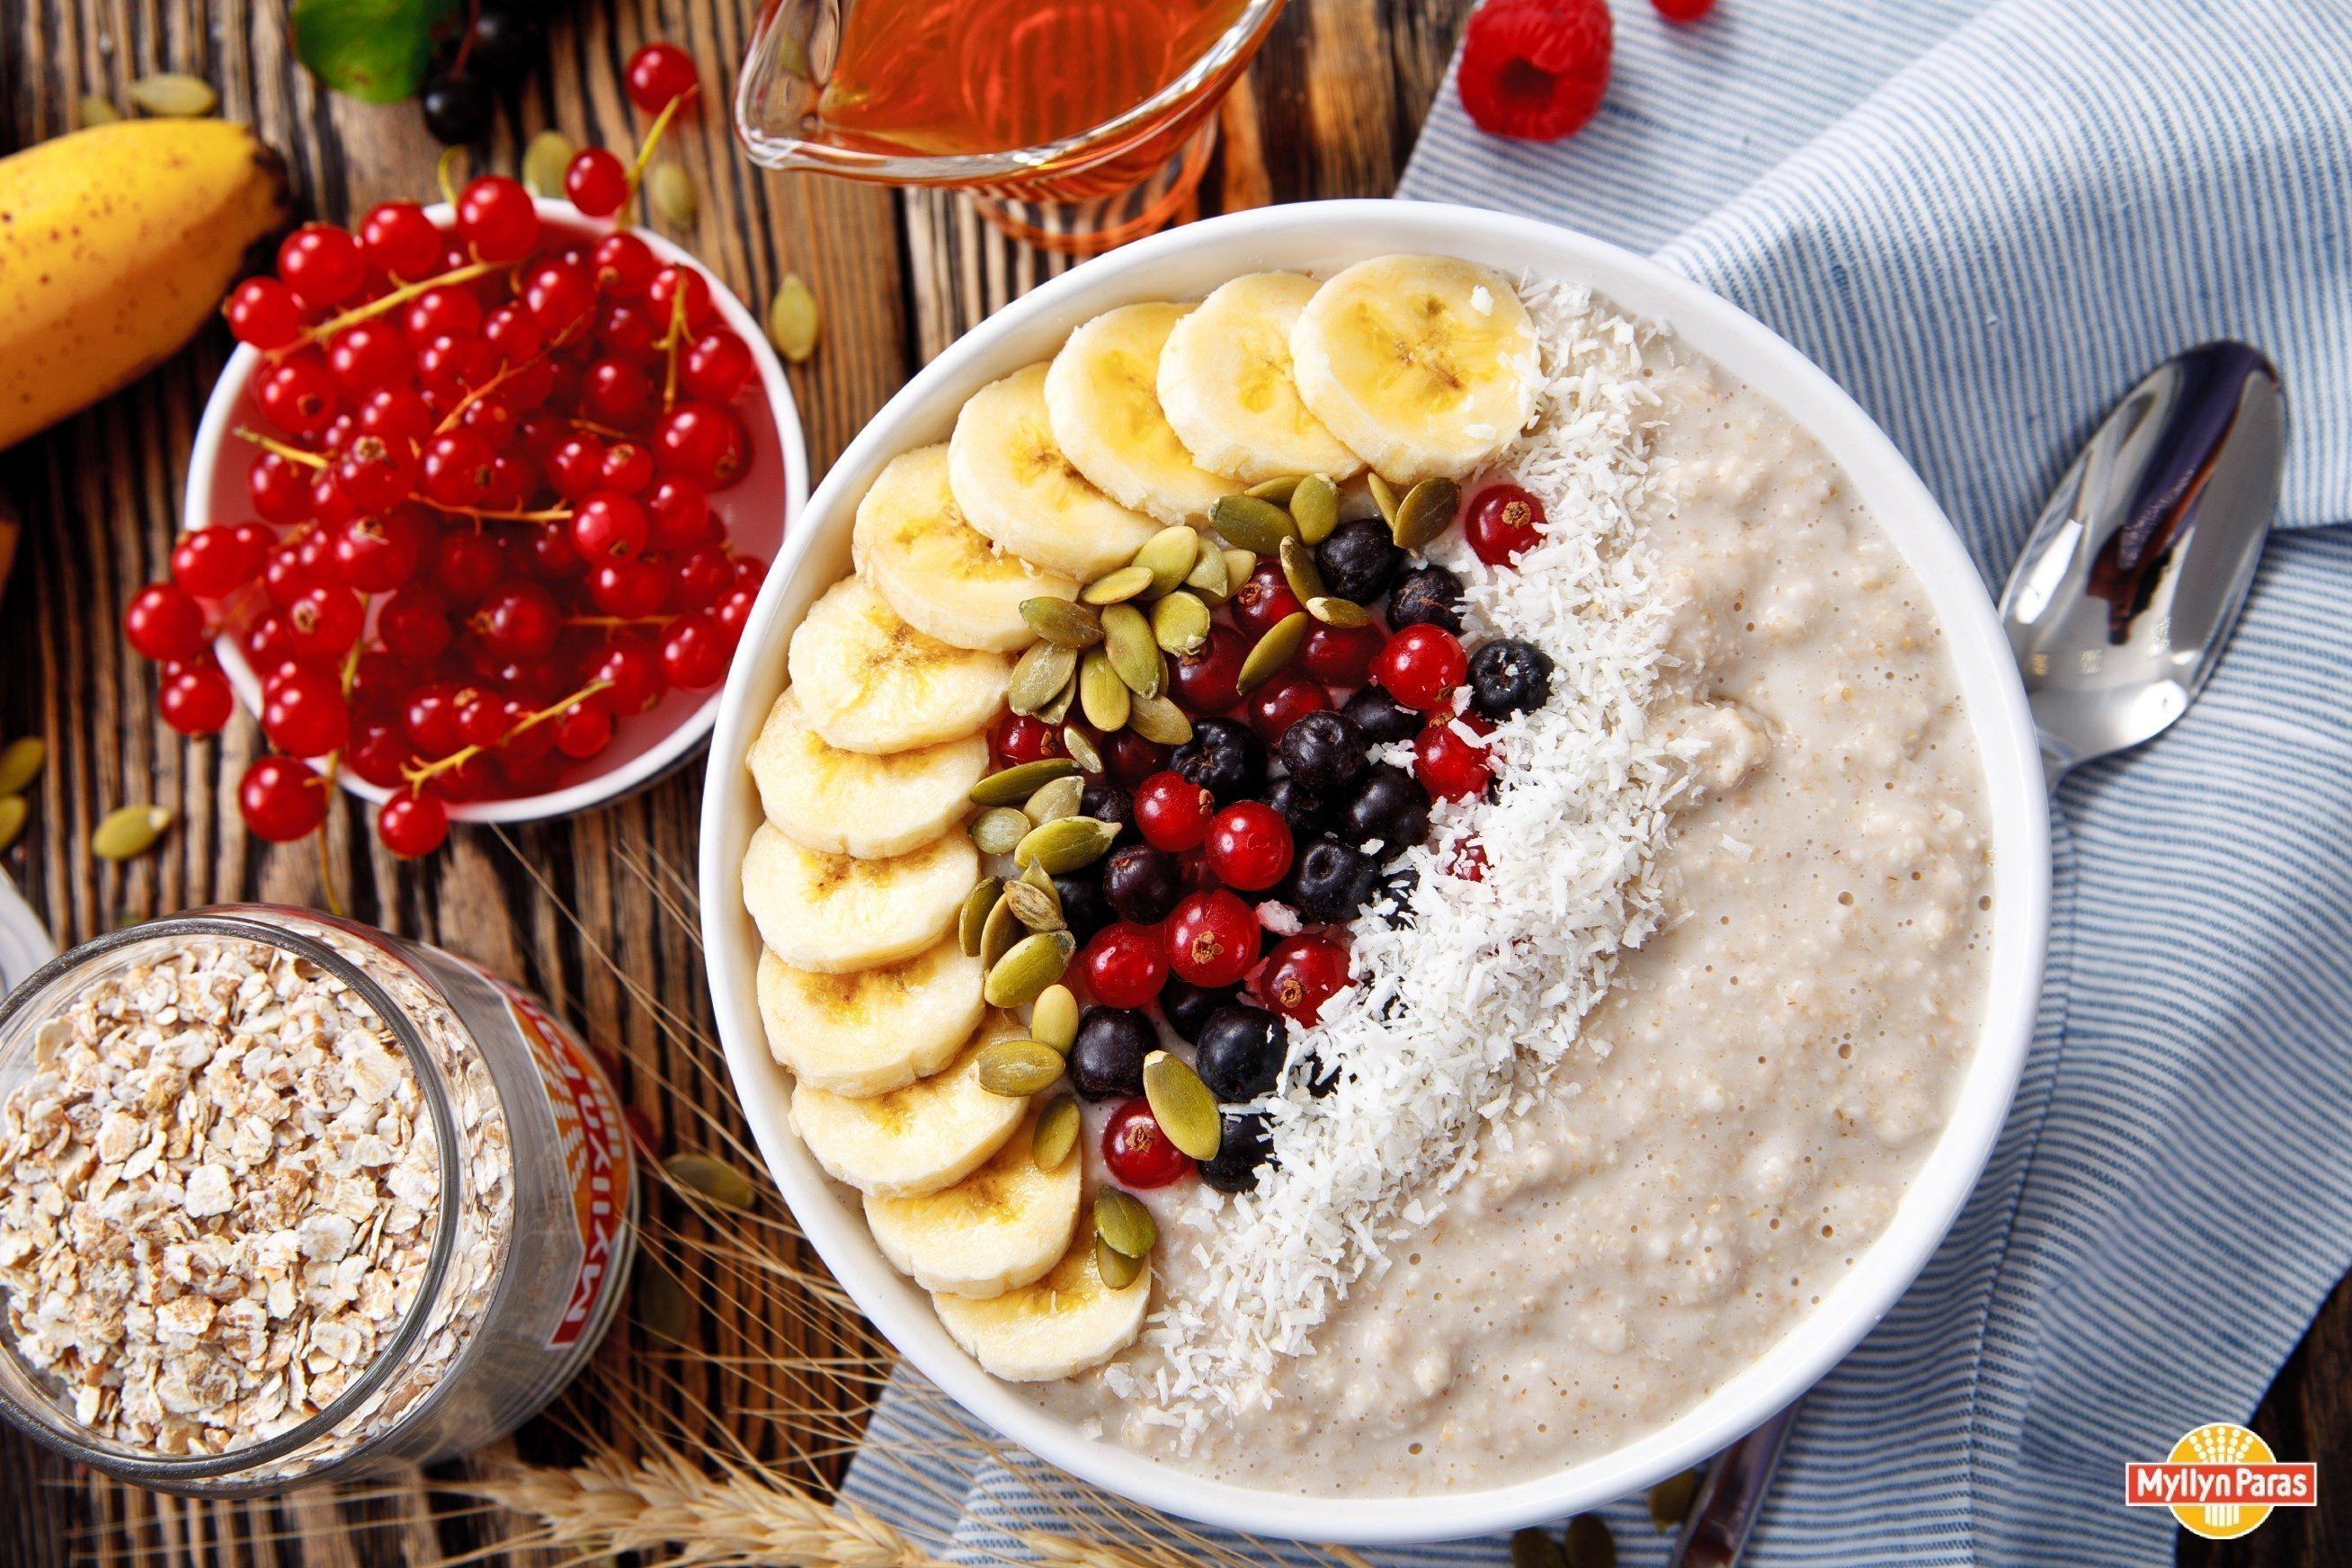 Ercole - Ricetta del porridge, quanti minuti cucini